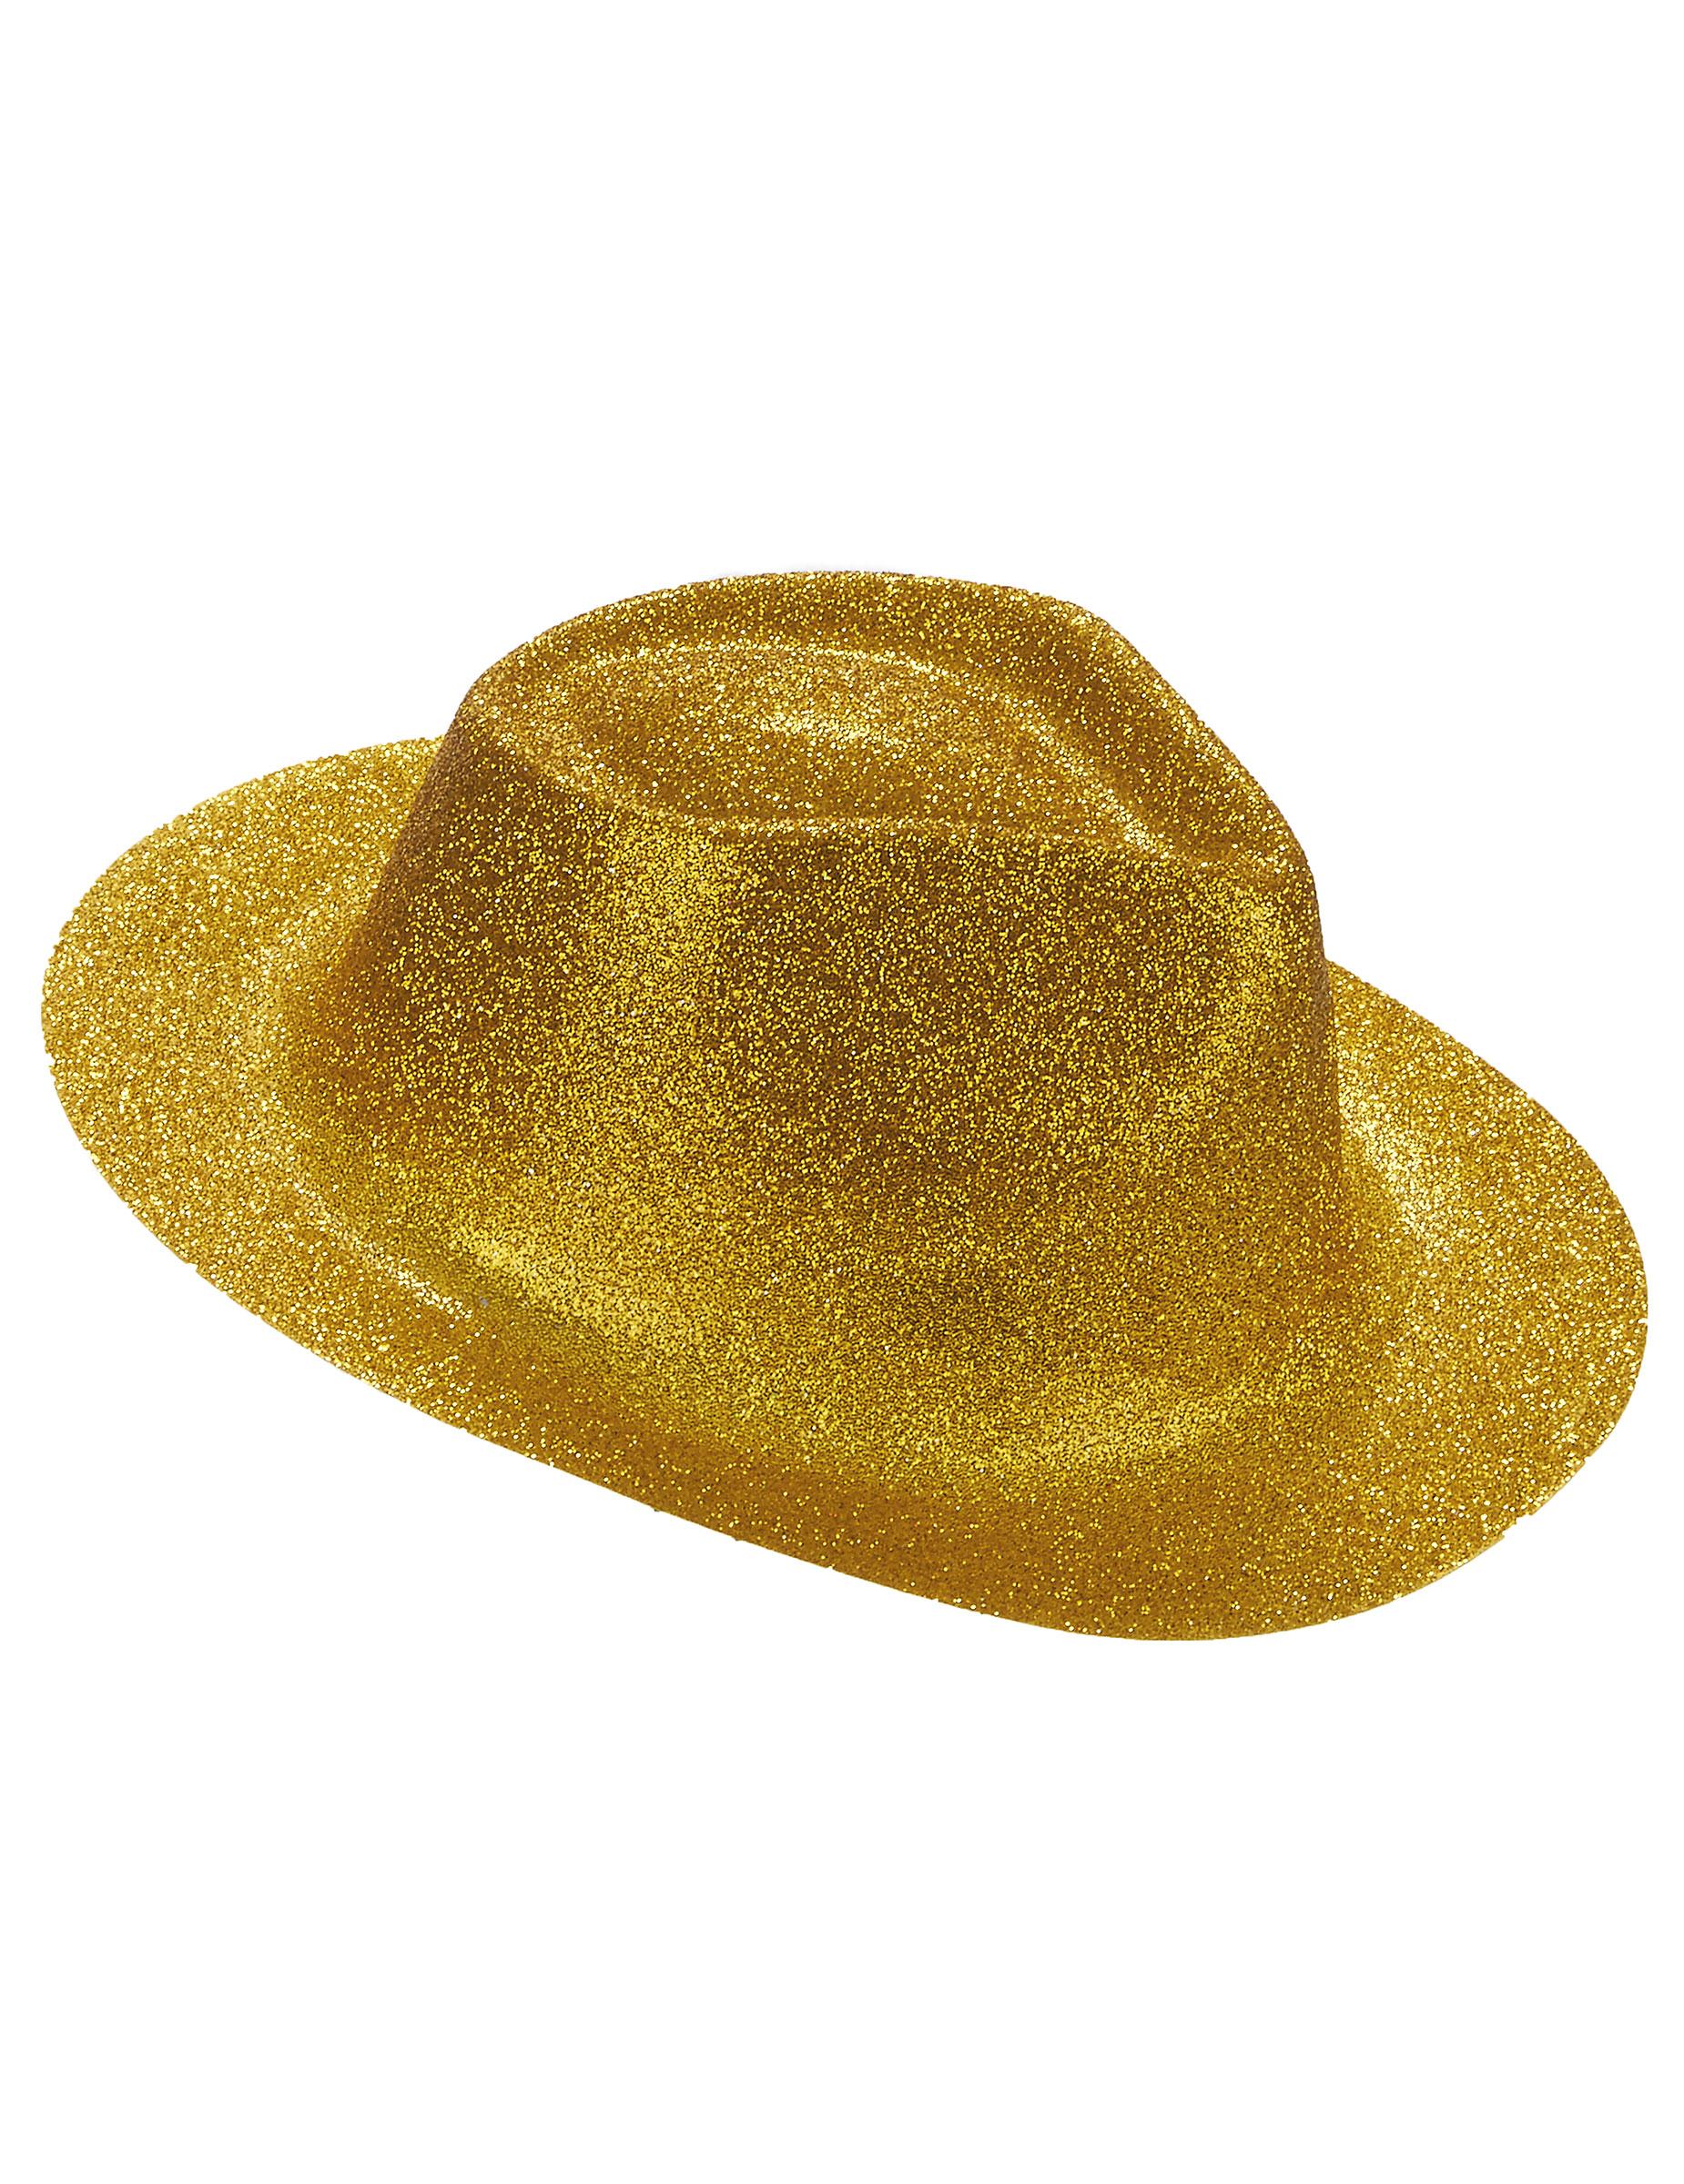 Sombrero purpurina dorada adulto  Sombreros 031f213fb6a